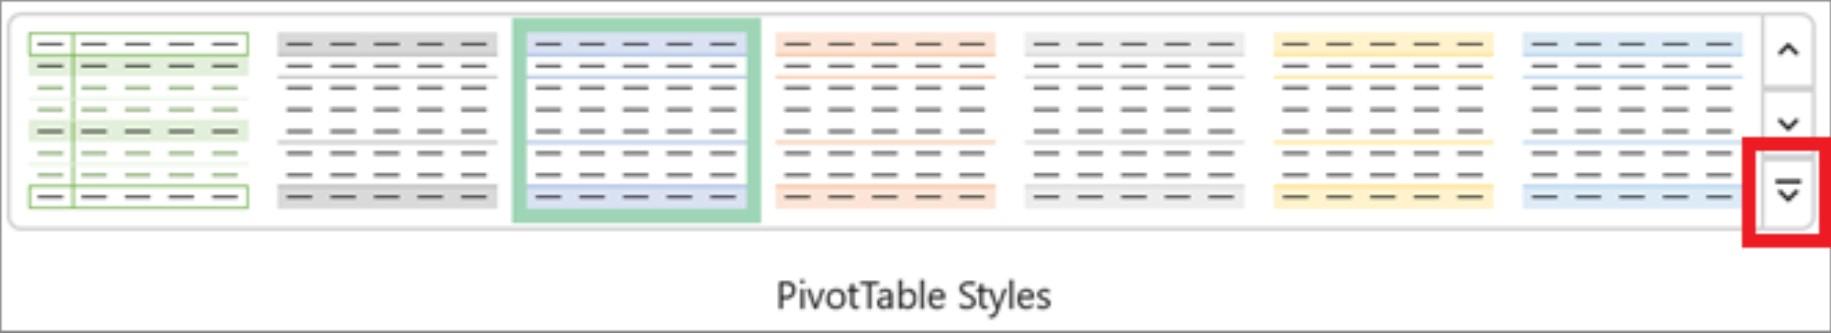 Slika Excelovega traku